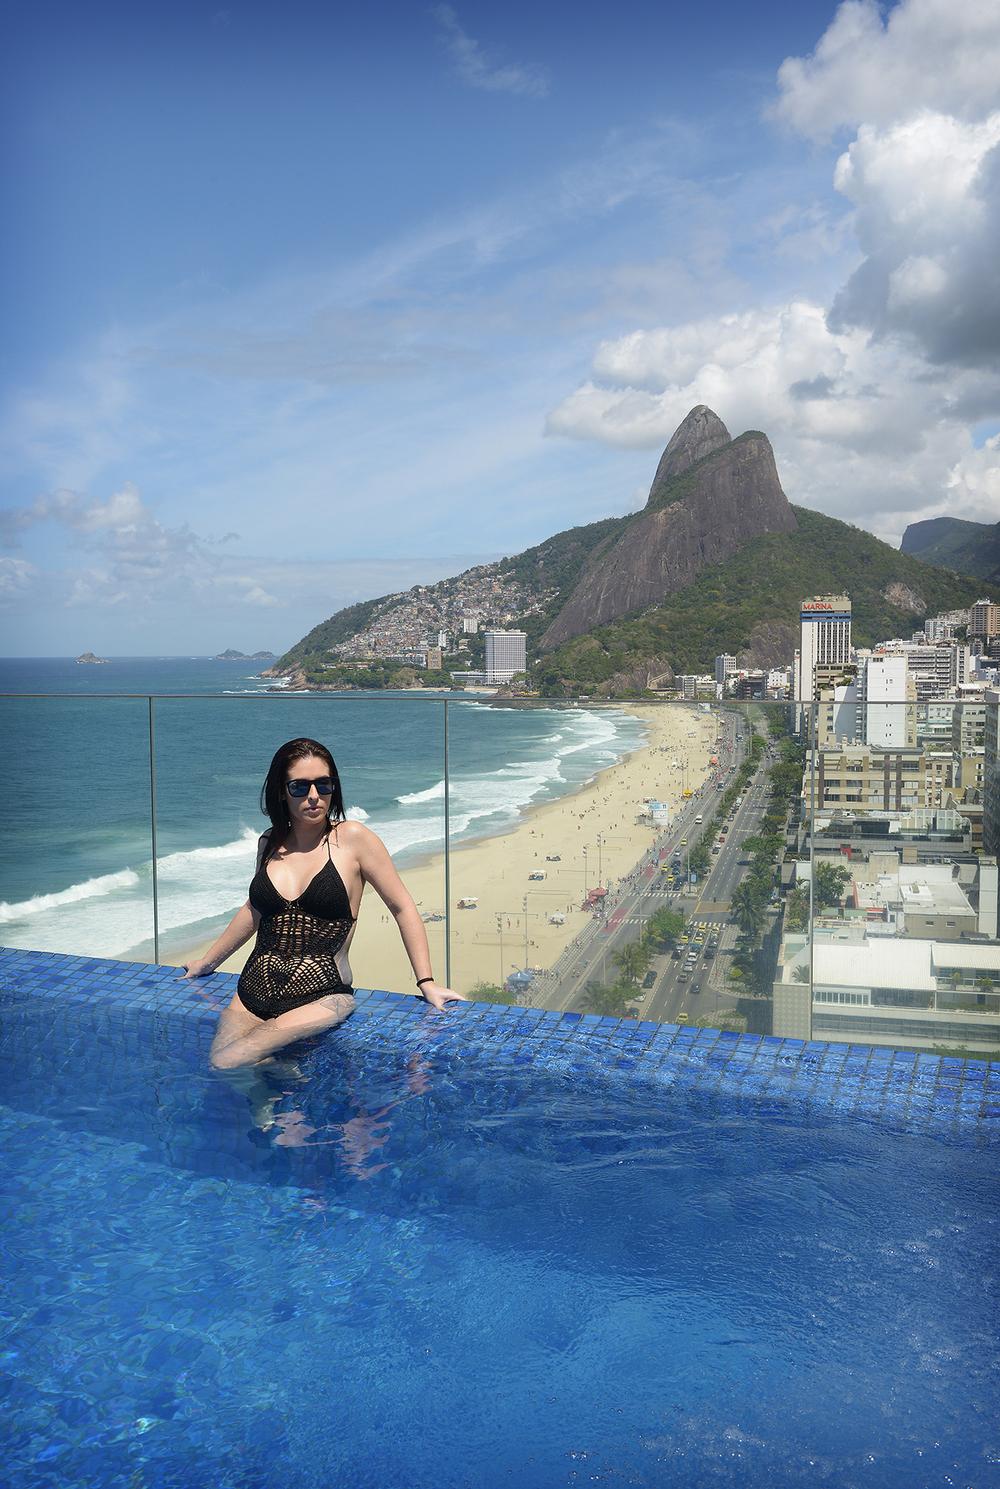 Rio de Janeiro, olympialaiset, uima-allas, maisemat, matkablogi, matka, ranta, Ipanema